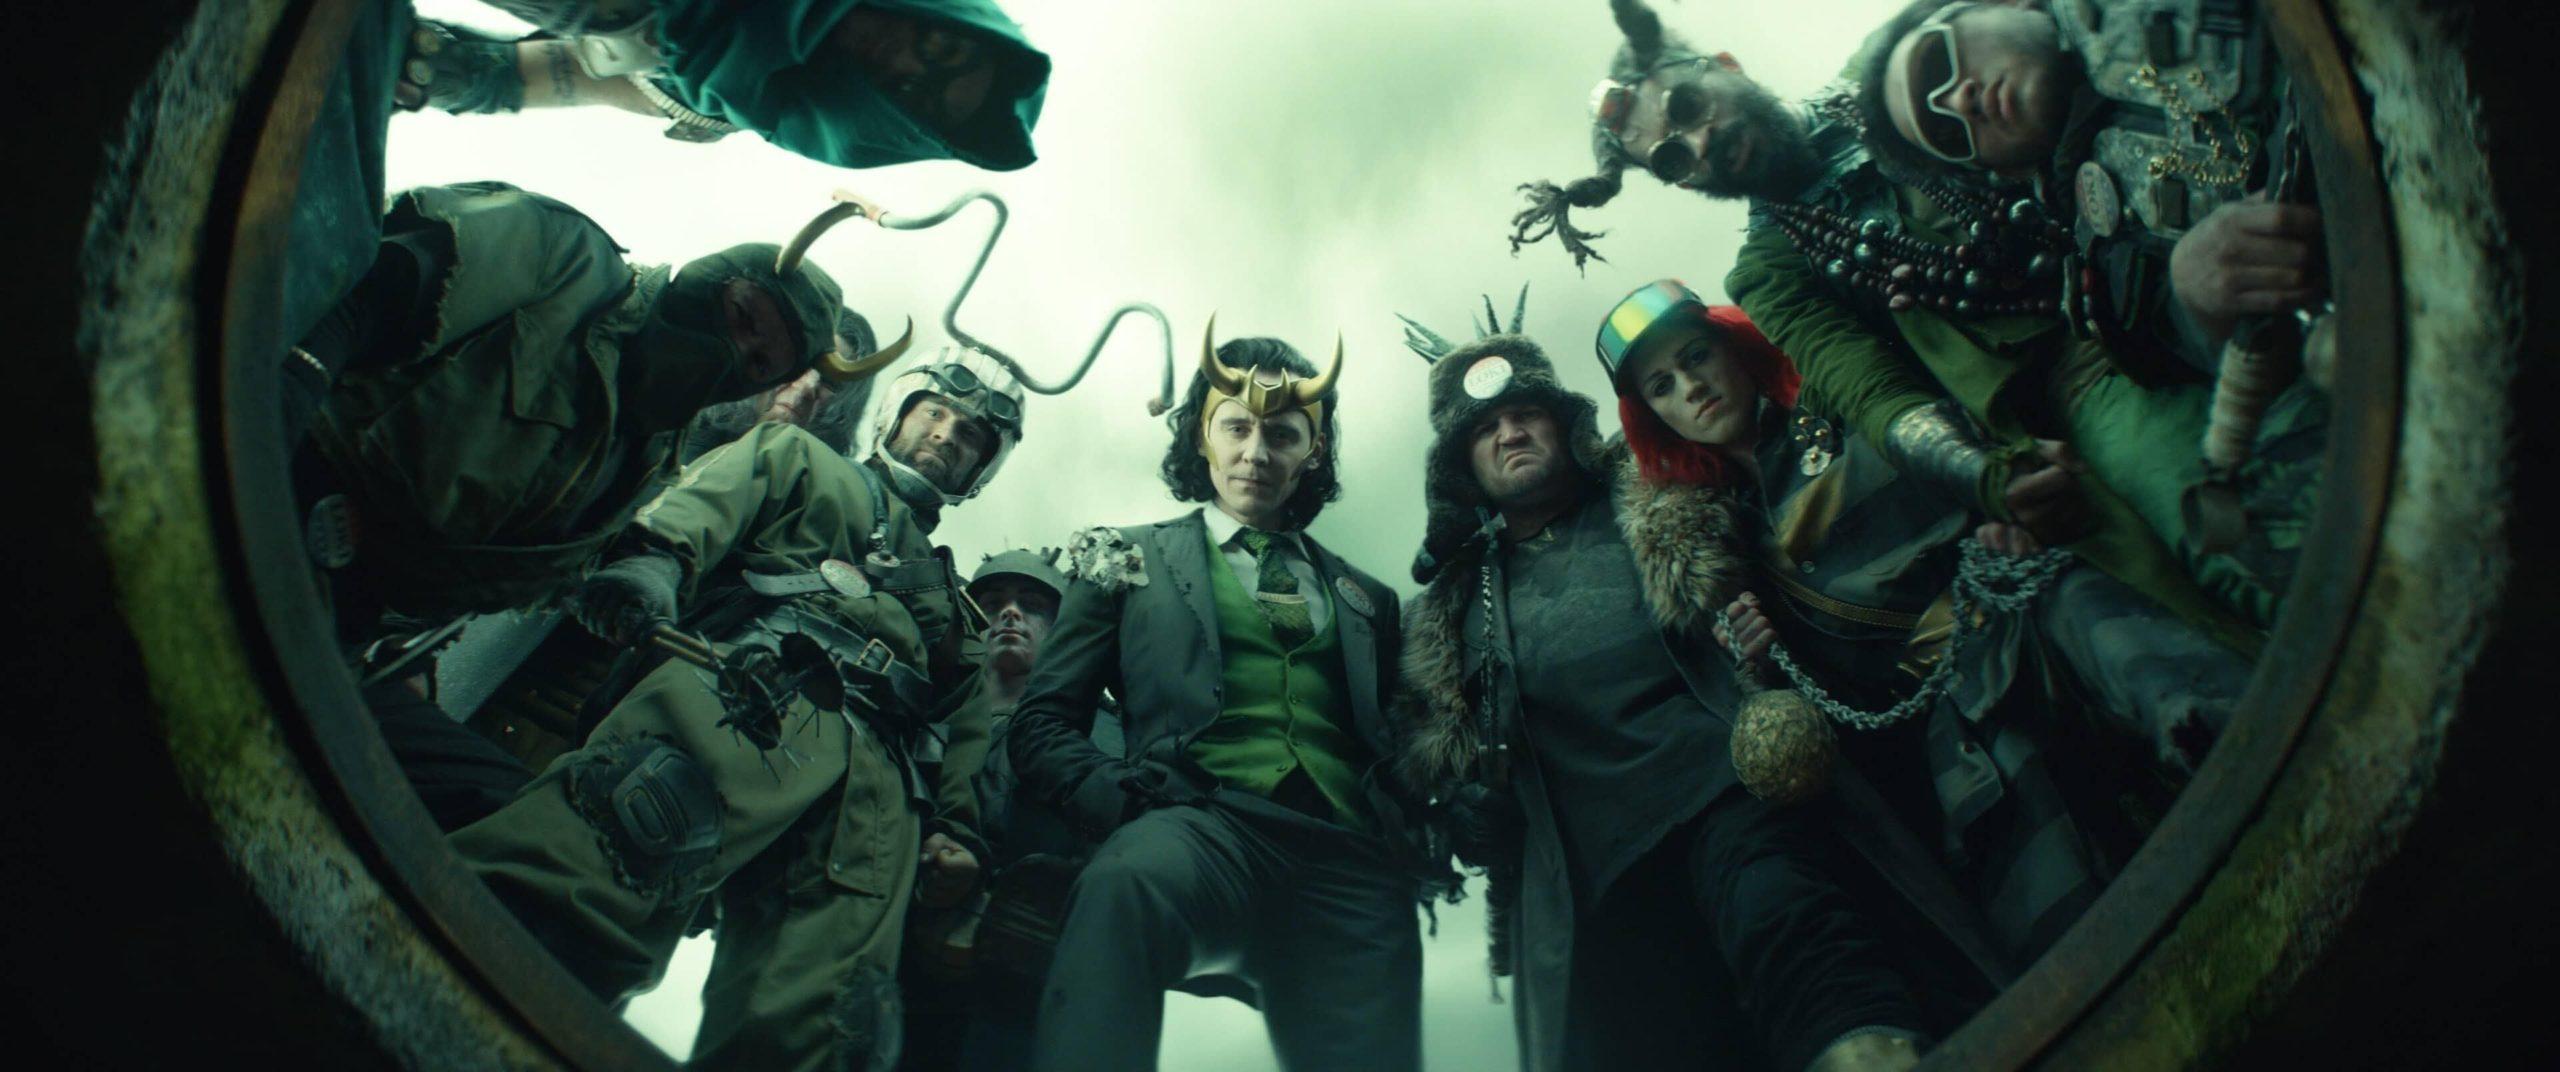 Loki y sus variantes de Loki -GamersRD